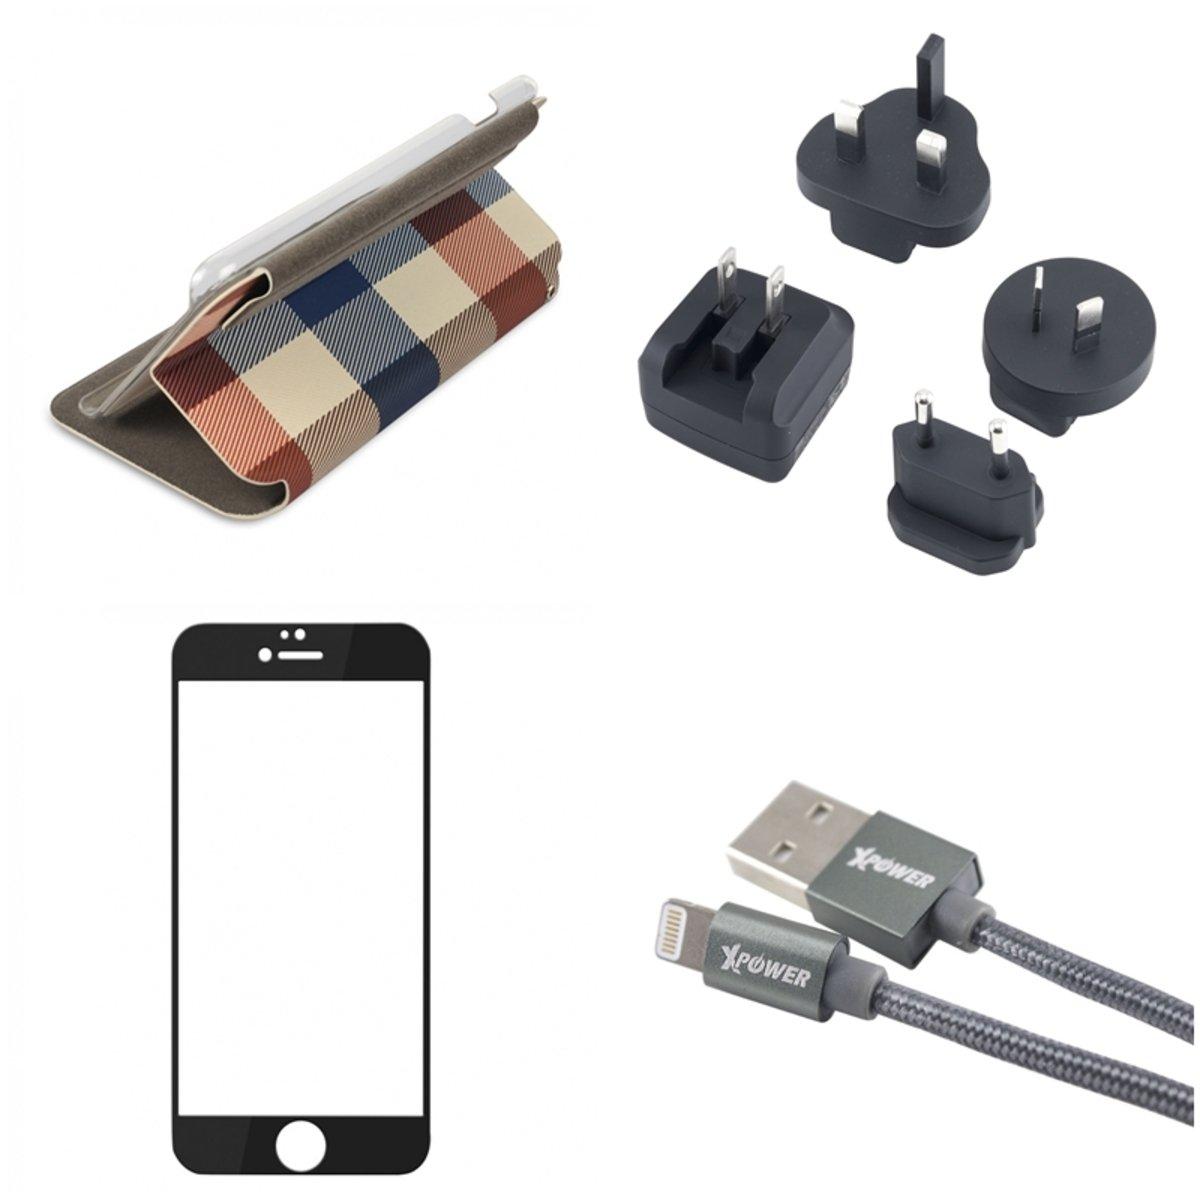 iPhone 6 Plus 充電保護套裝 (一套四件) -杏色格手機套